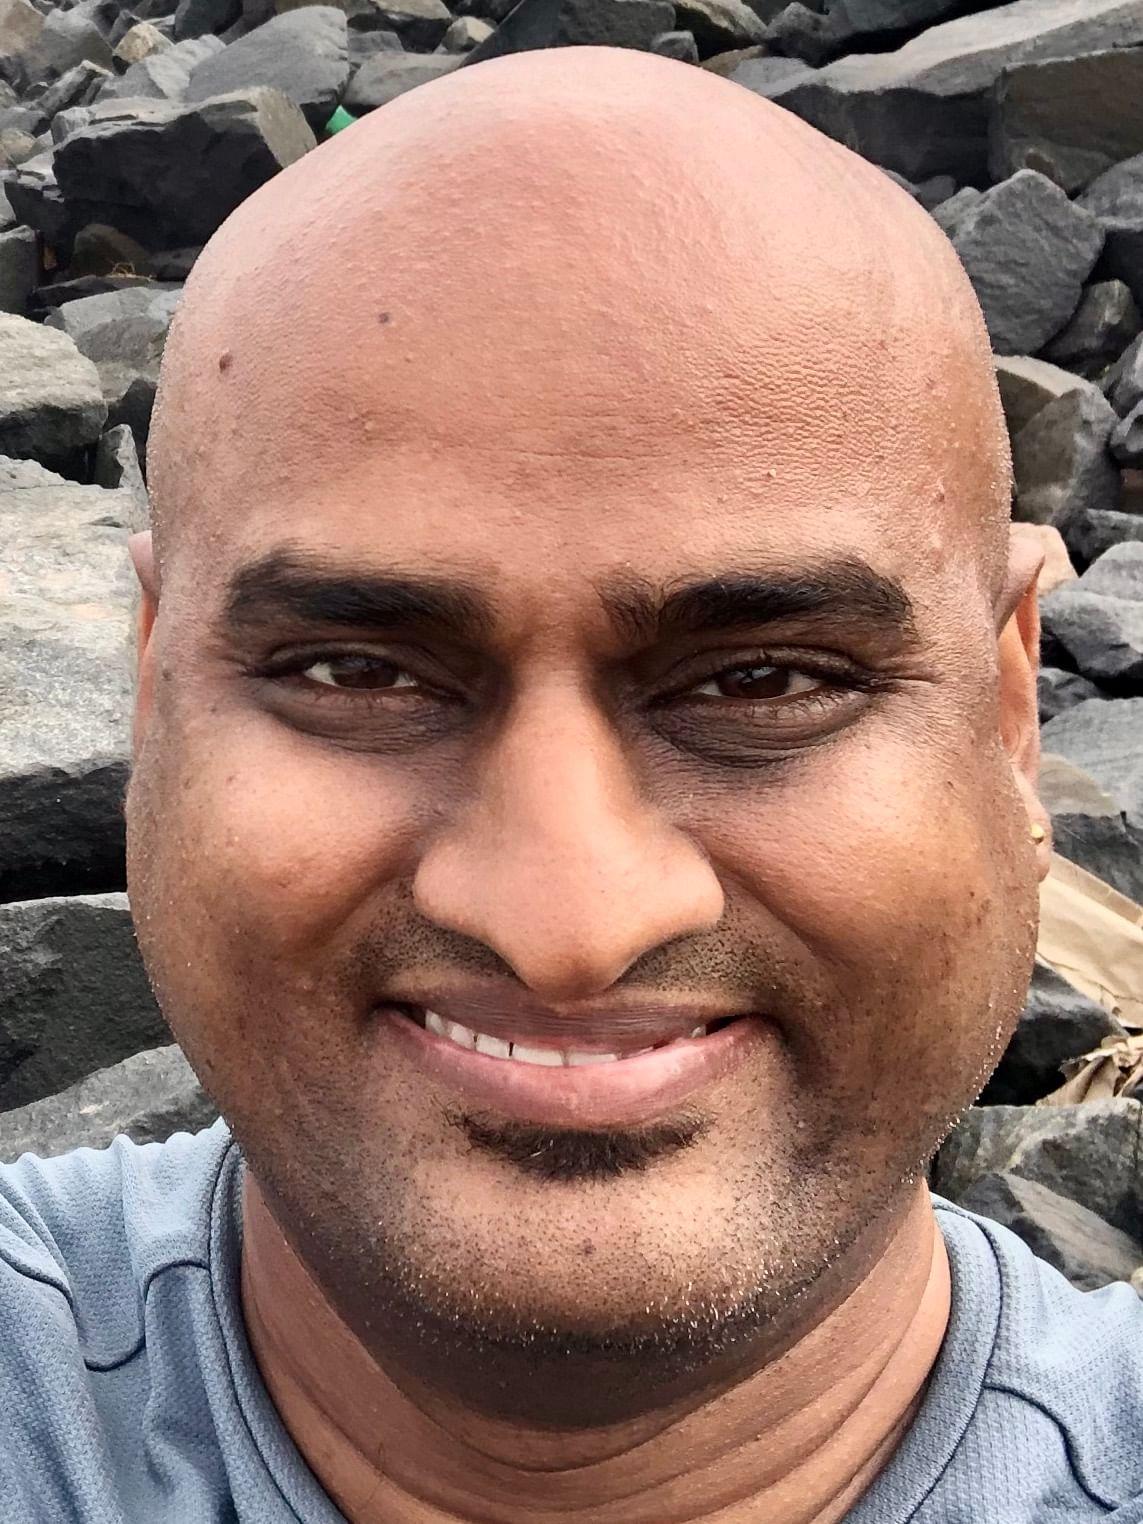 SlashDr.com நிறுவனத்தின் சி.இ.ஓ கோகுல் விஸ்வேஸ்வரன்.